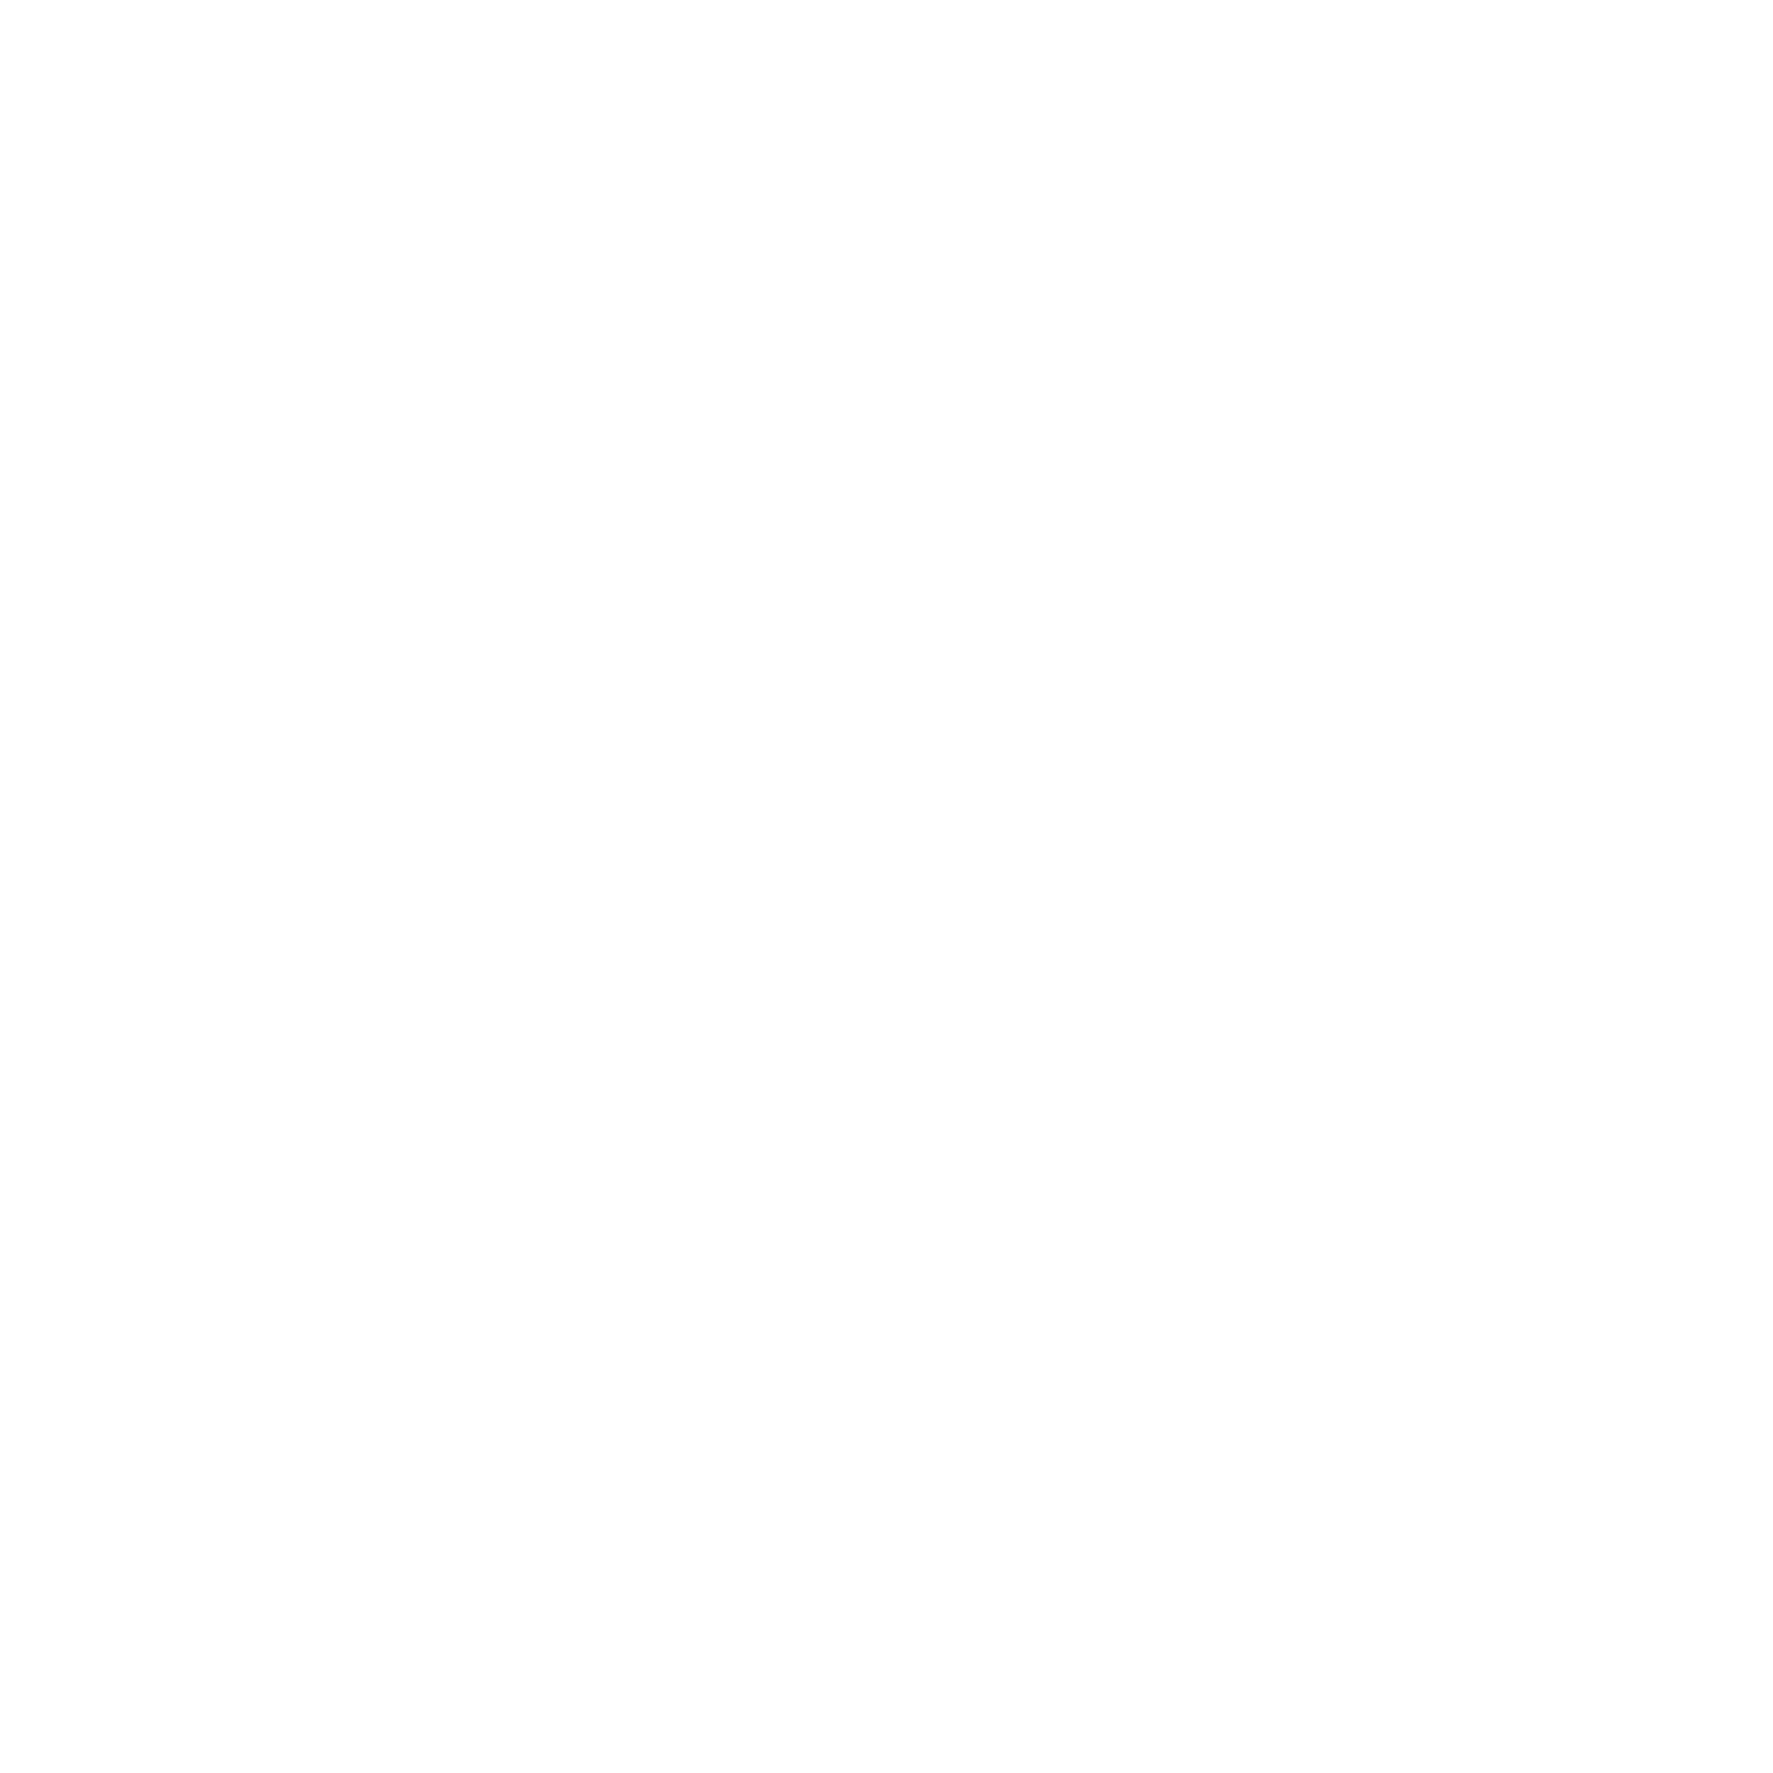 fg_hymagasinet_logo_symbol_hvit_v_v